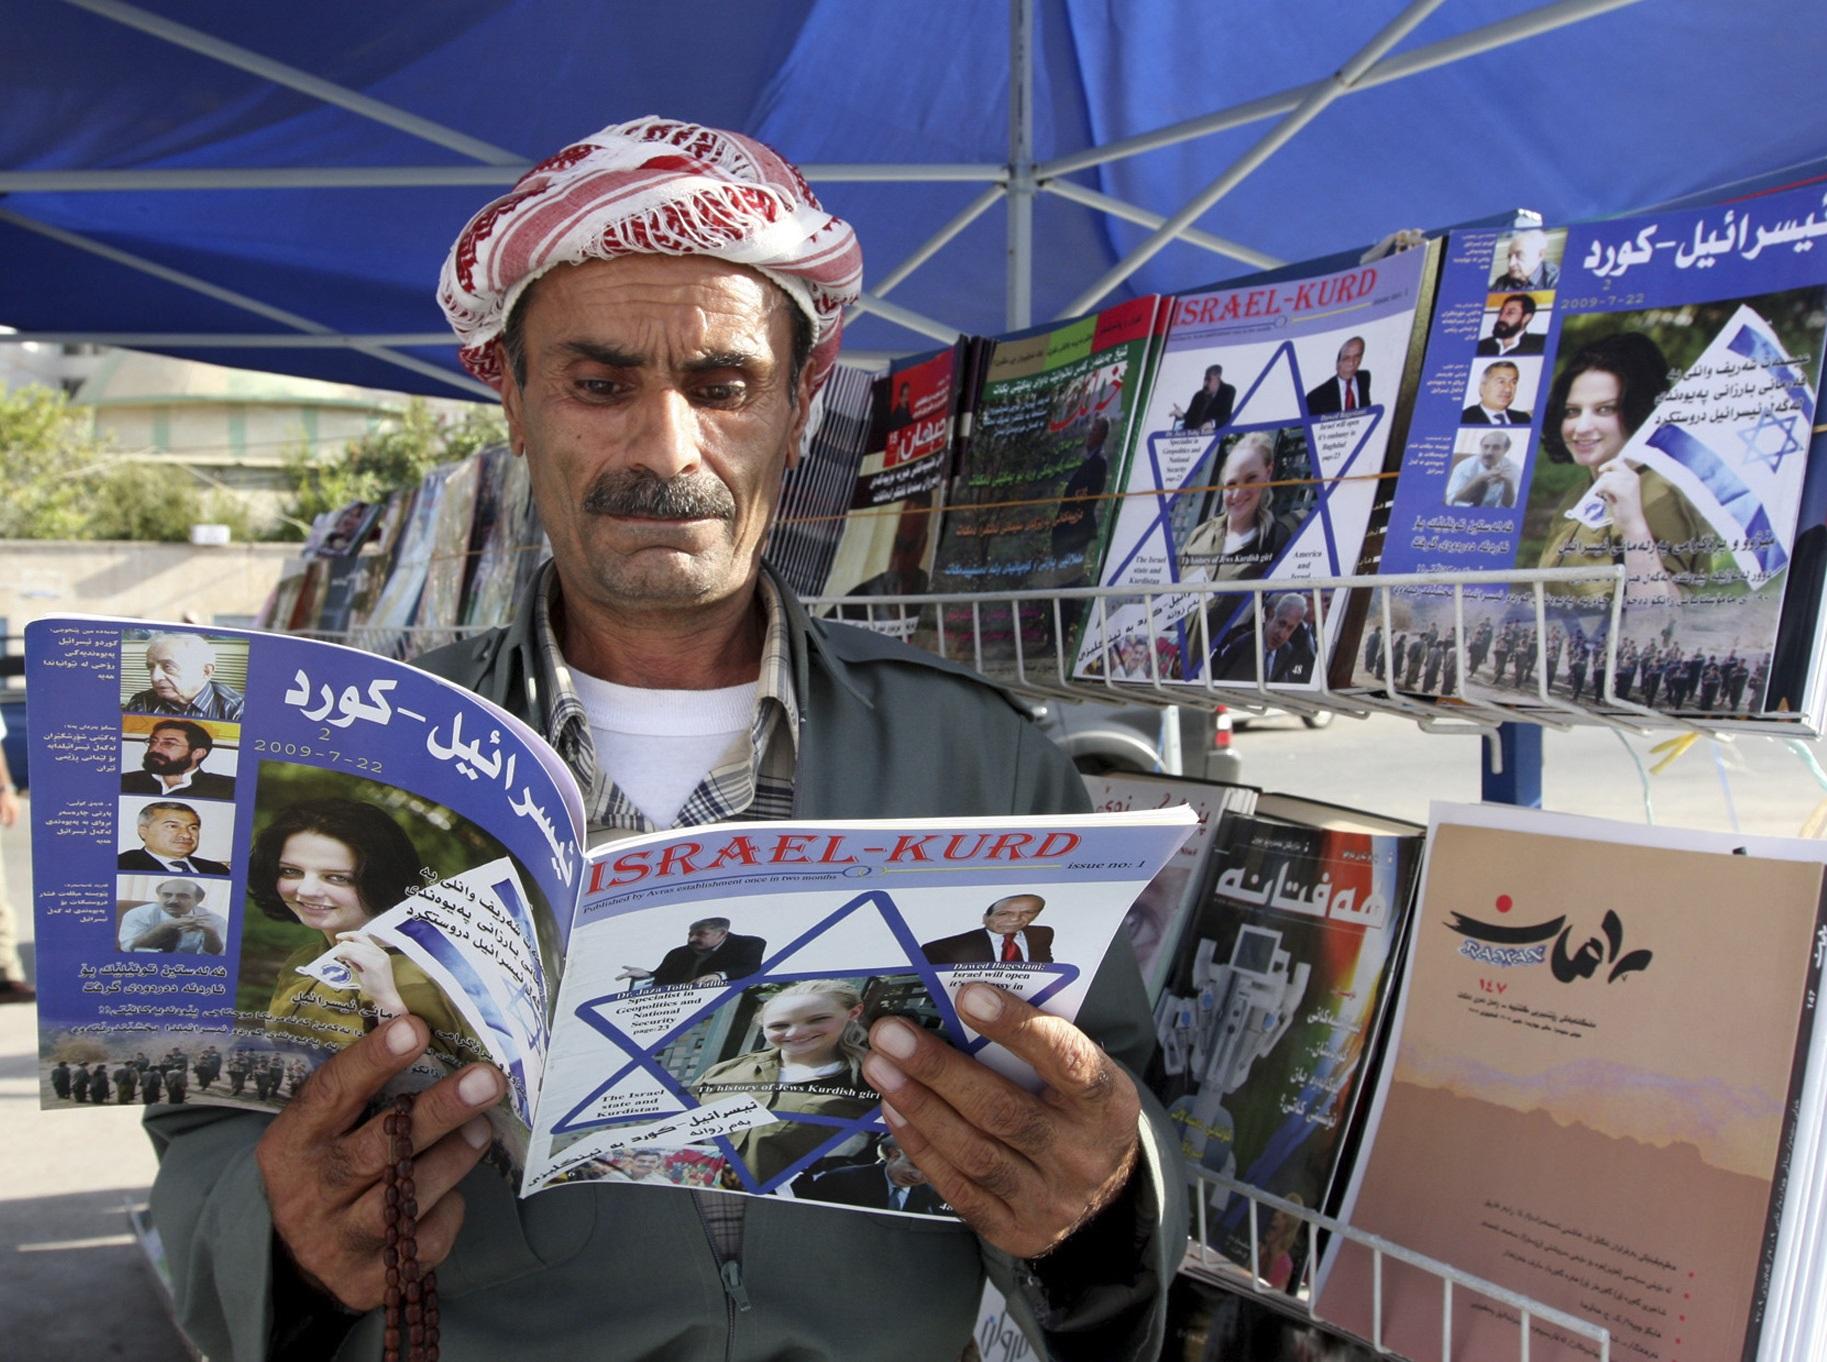 Pria Kurdi membaca majalah Israel-Kurd.